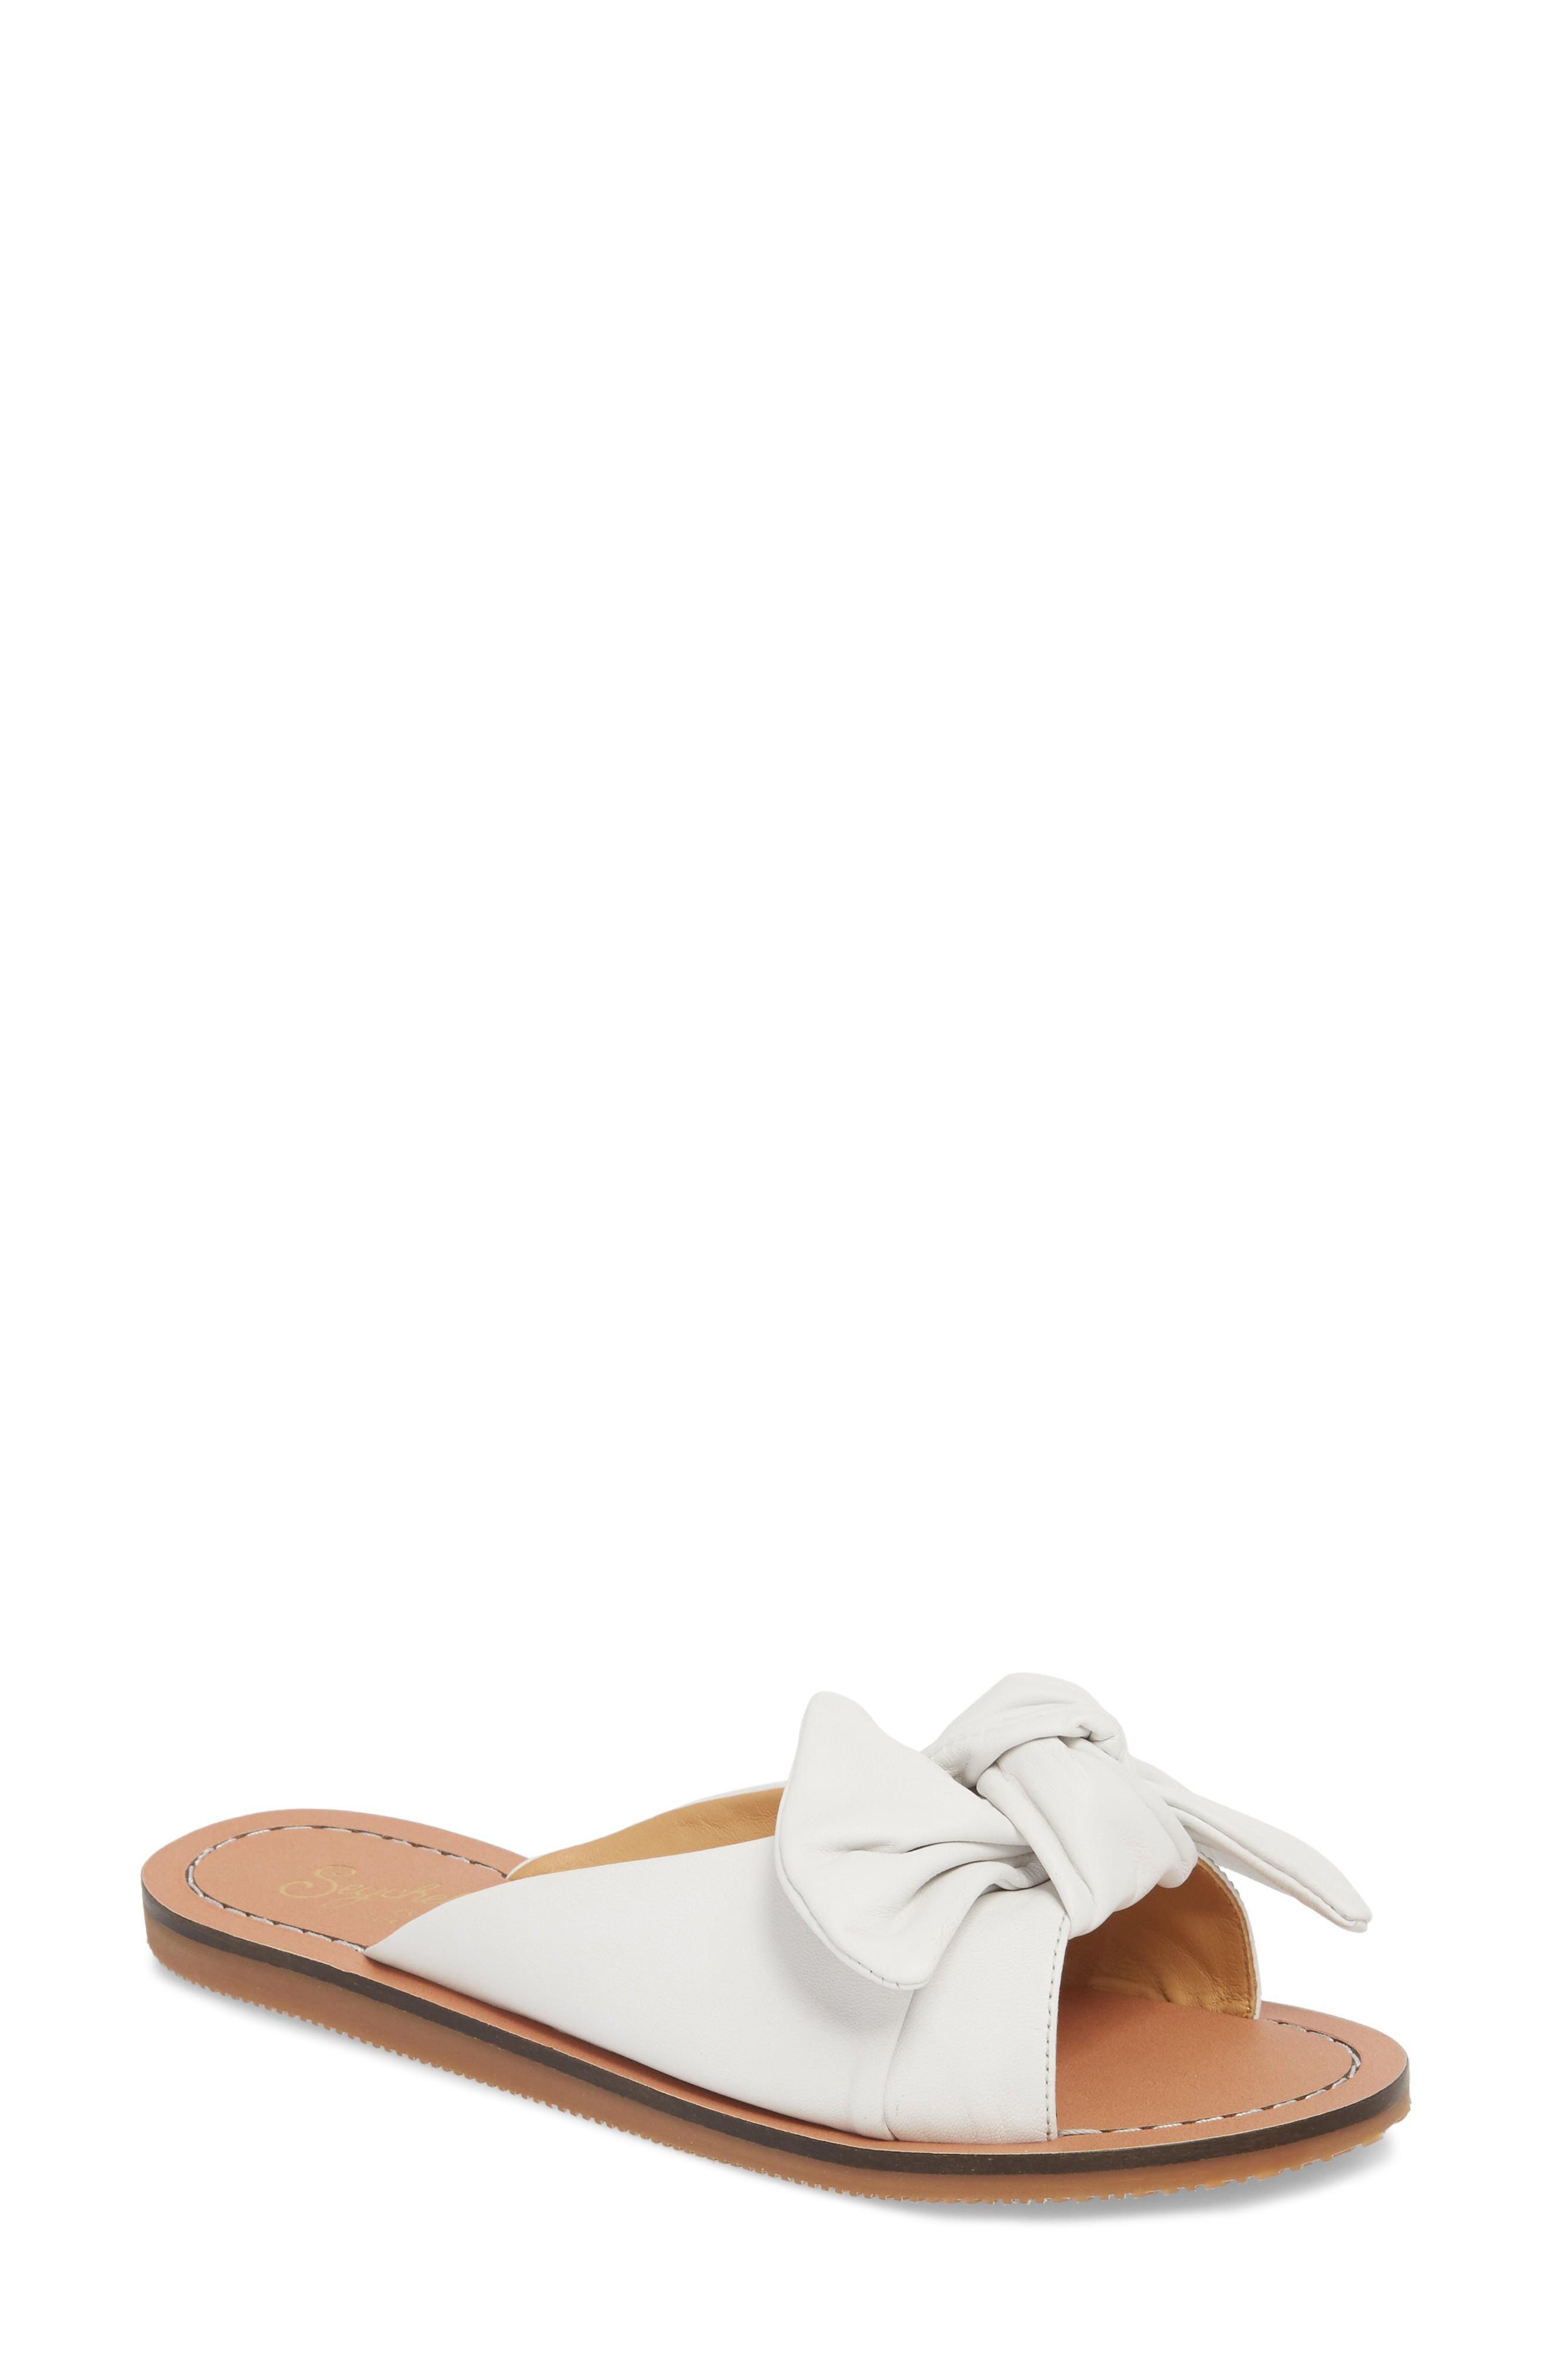 Seychelles Childlike Enthusiam Slide Sandal In White Leather